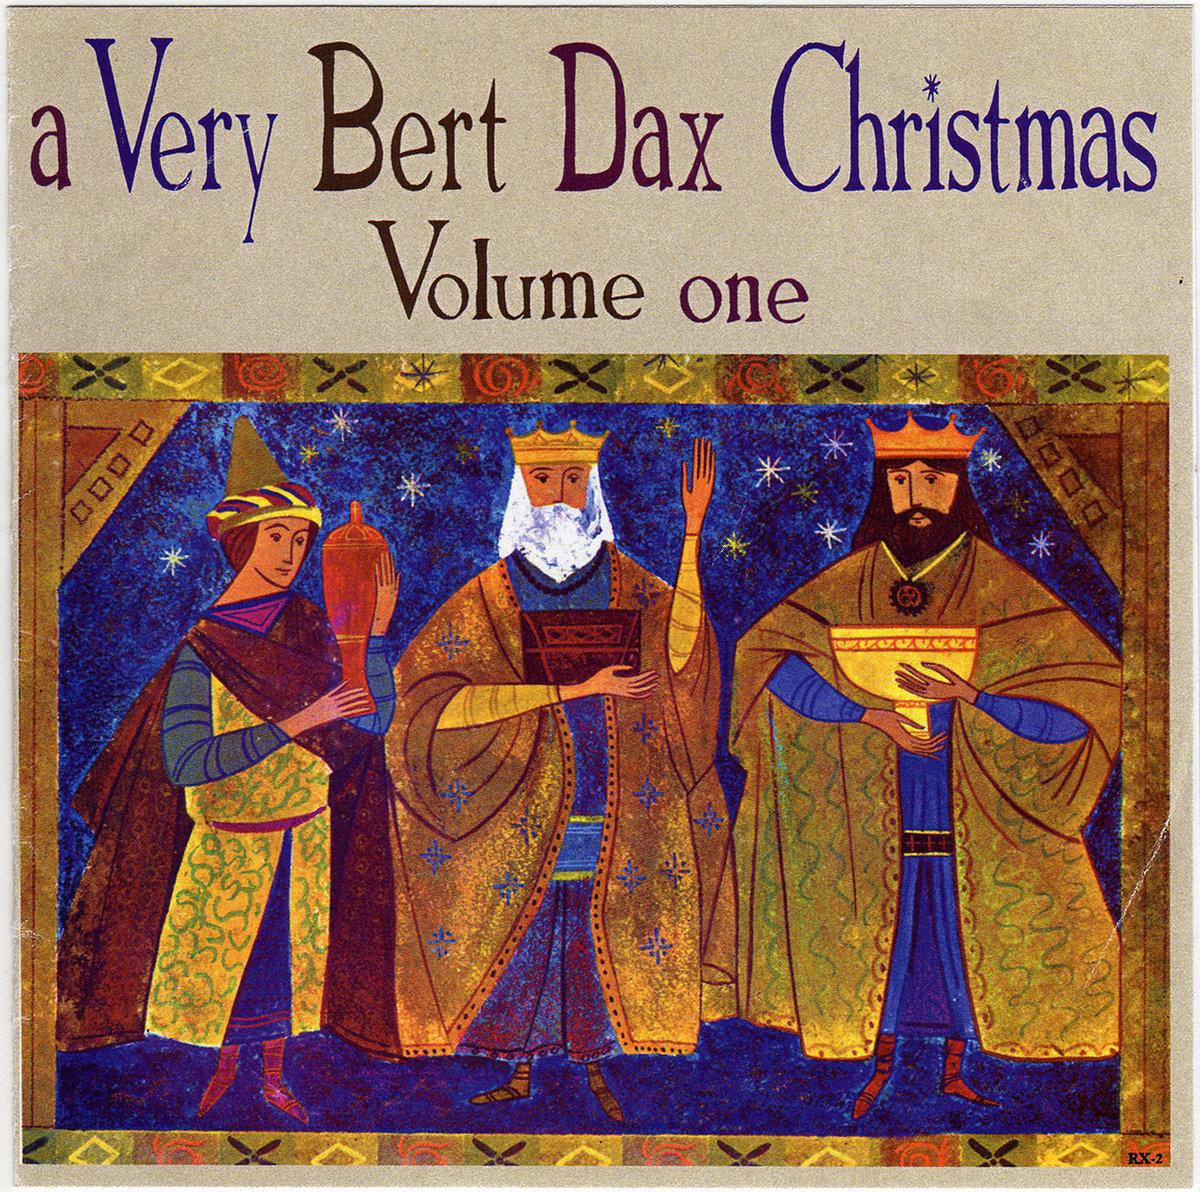 A Very Bert Dax Christmas, Volume One   The Bert Dax Cavalcade Of Stars